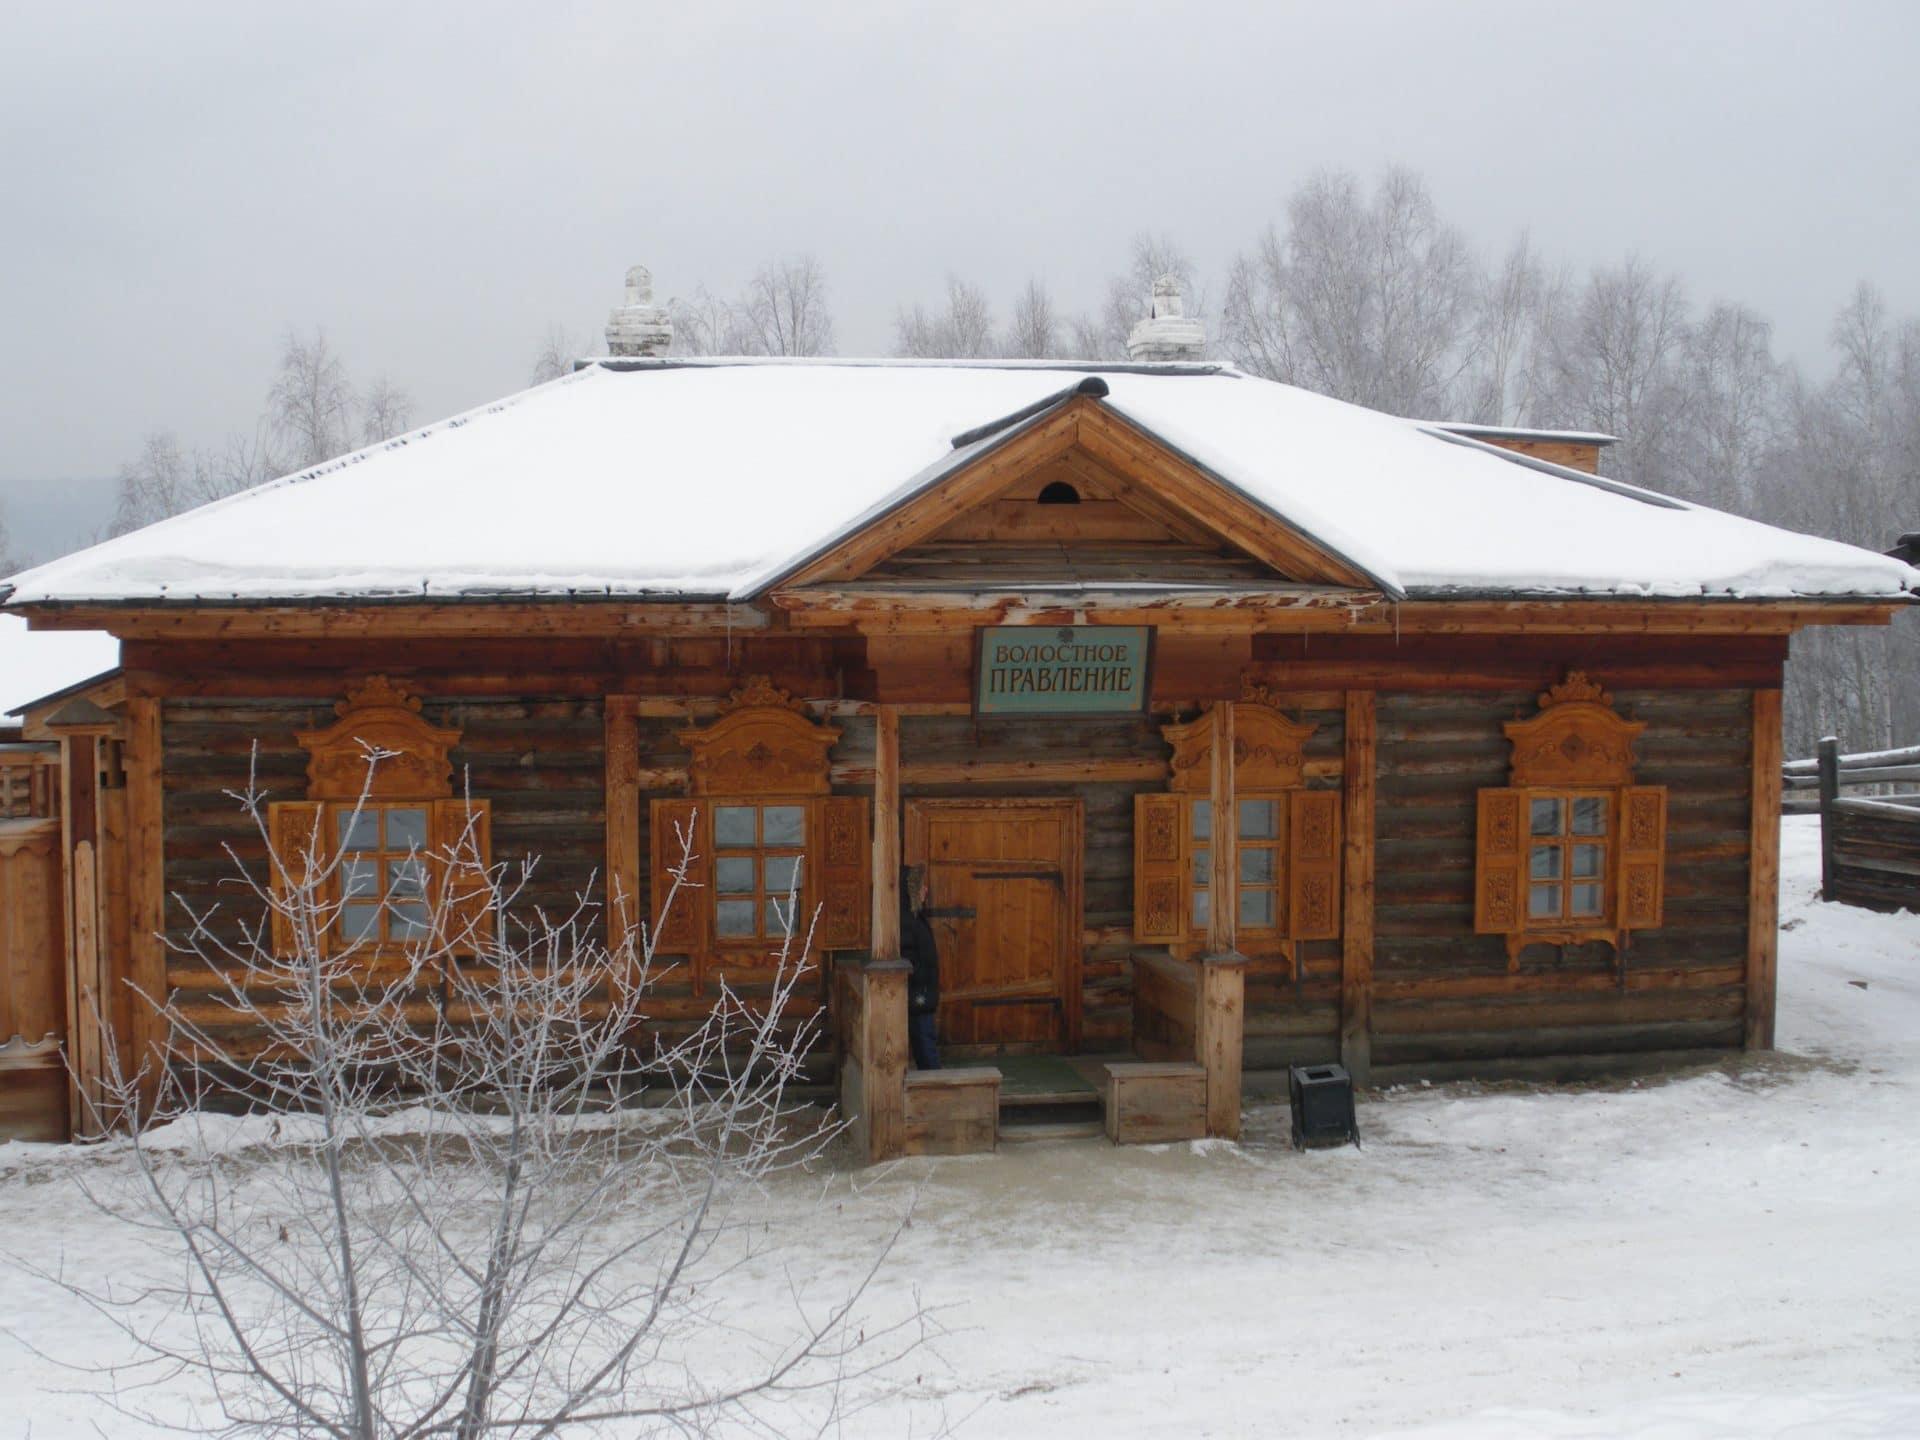 russie-siberie-lac-baikal-goyav